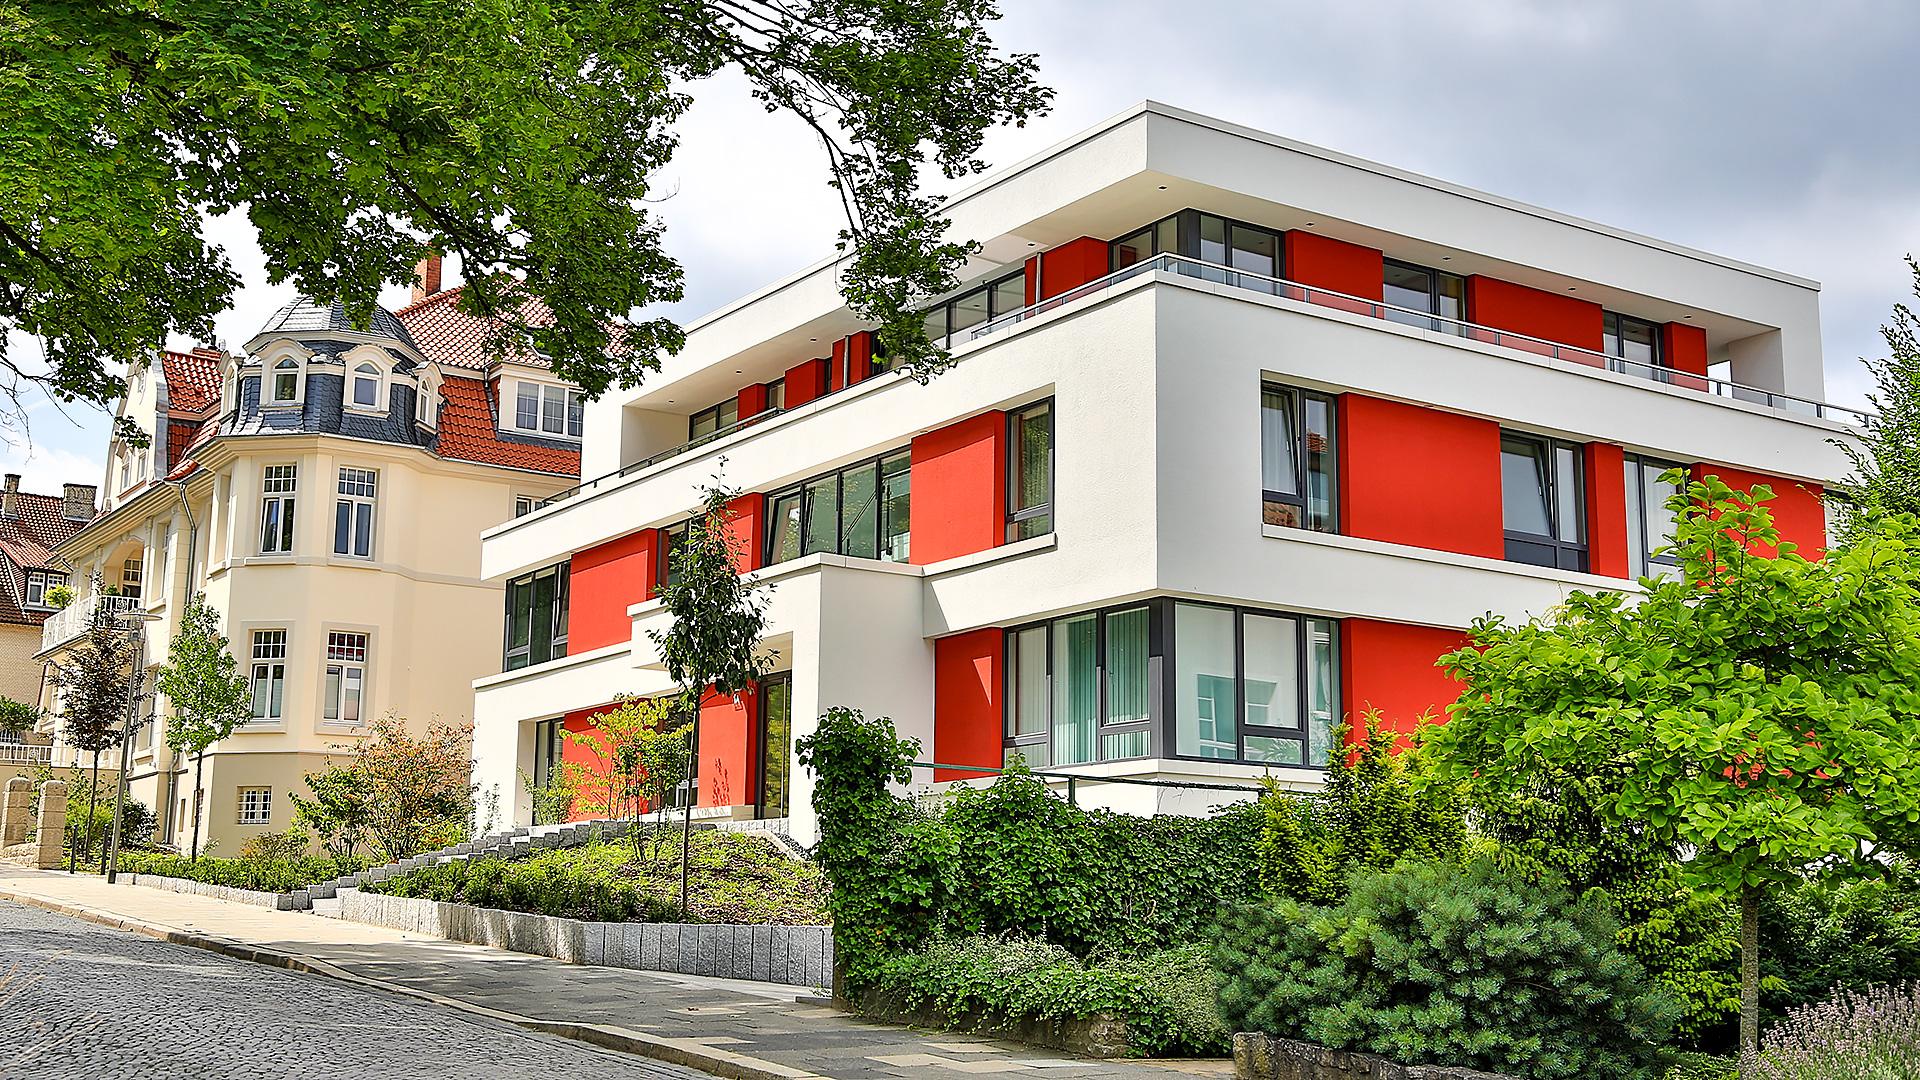 neubau mehrfamilienhaus in hildesheim jung. Black Bedroom Furniture Sets. Home Design Ideas